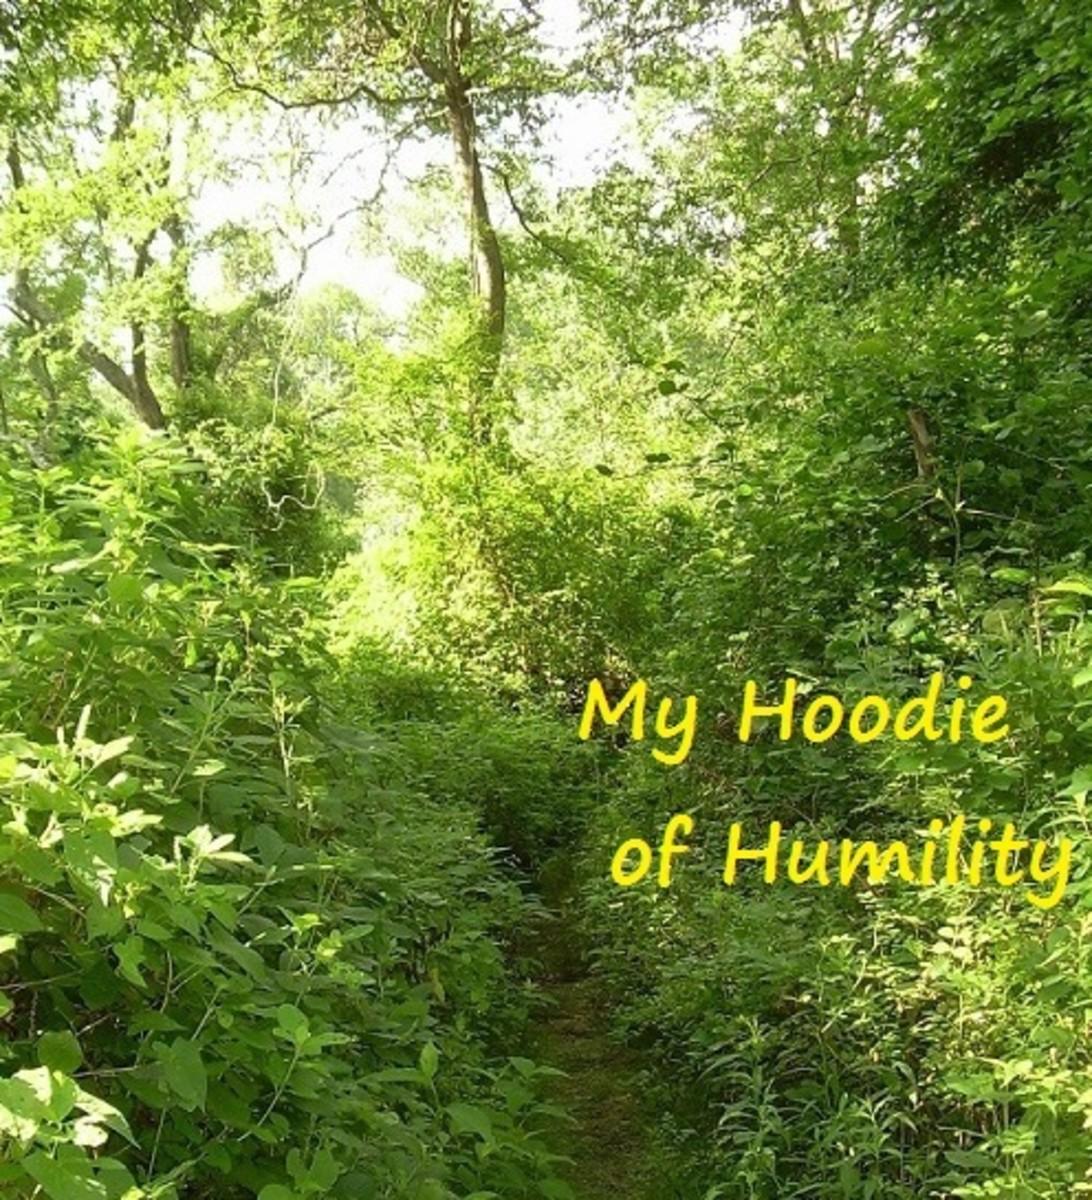 My Hoodie of Humility